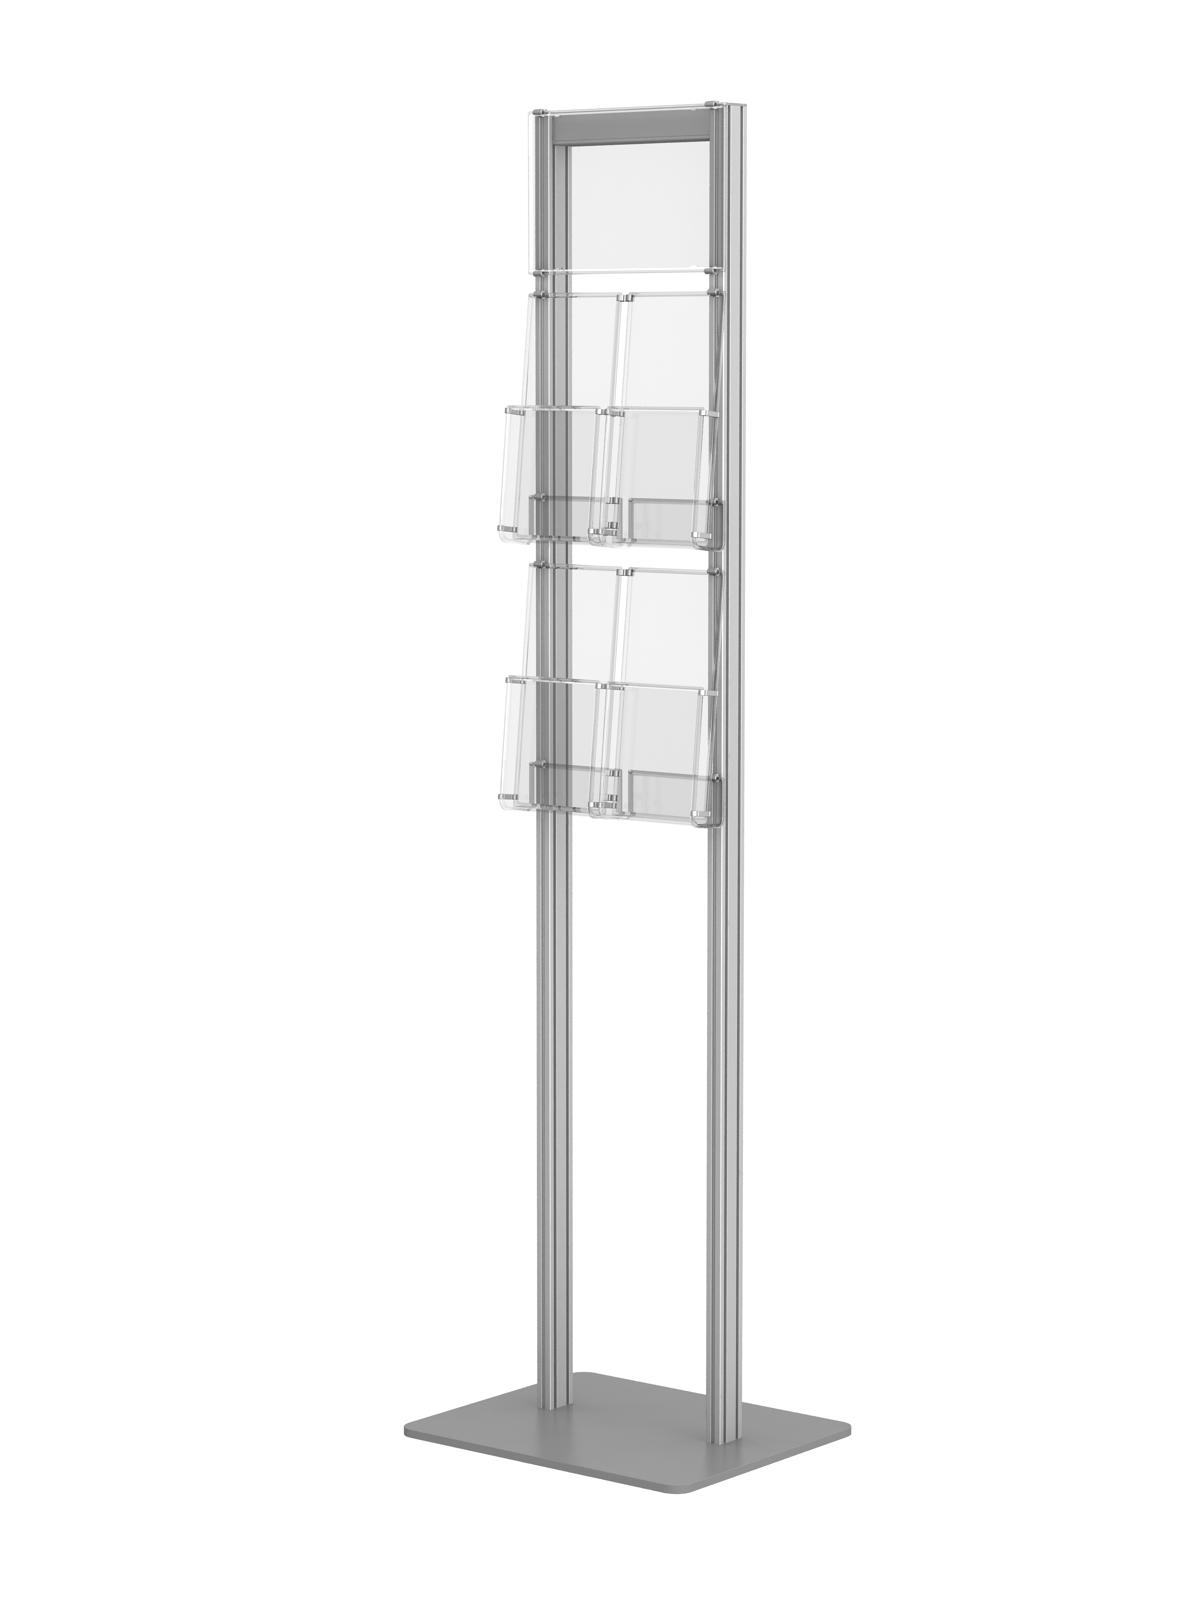 Ogromny stojak na ulotki prezenter ekspozytor ulotek 4x DL i 1x A5 ____Art 360 TT08